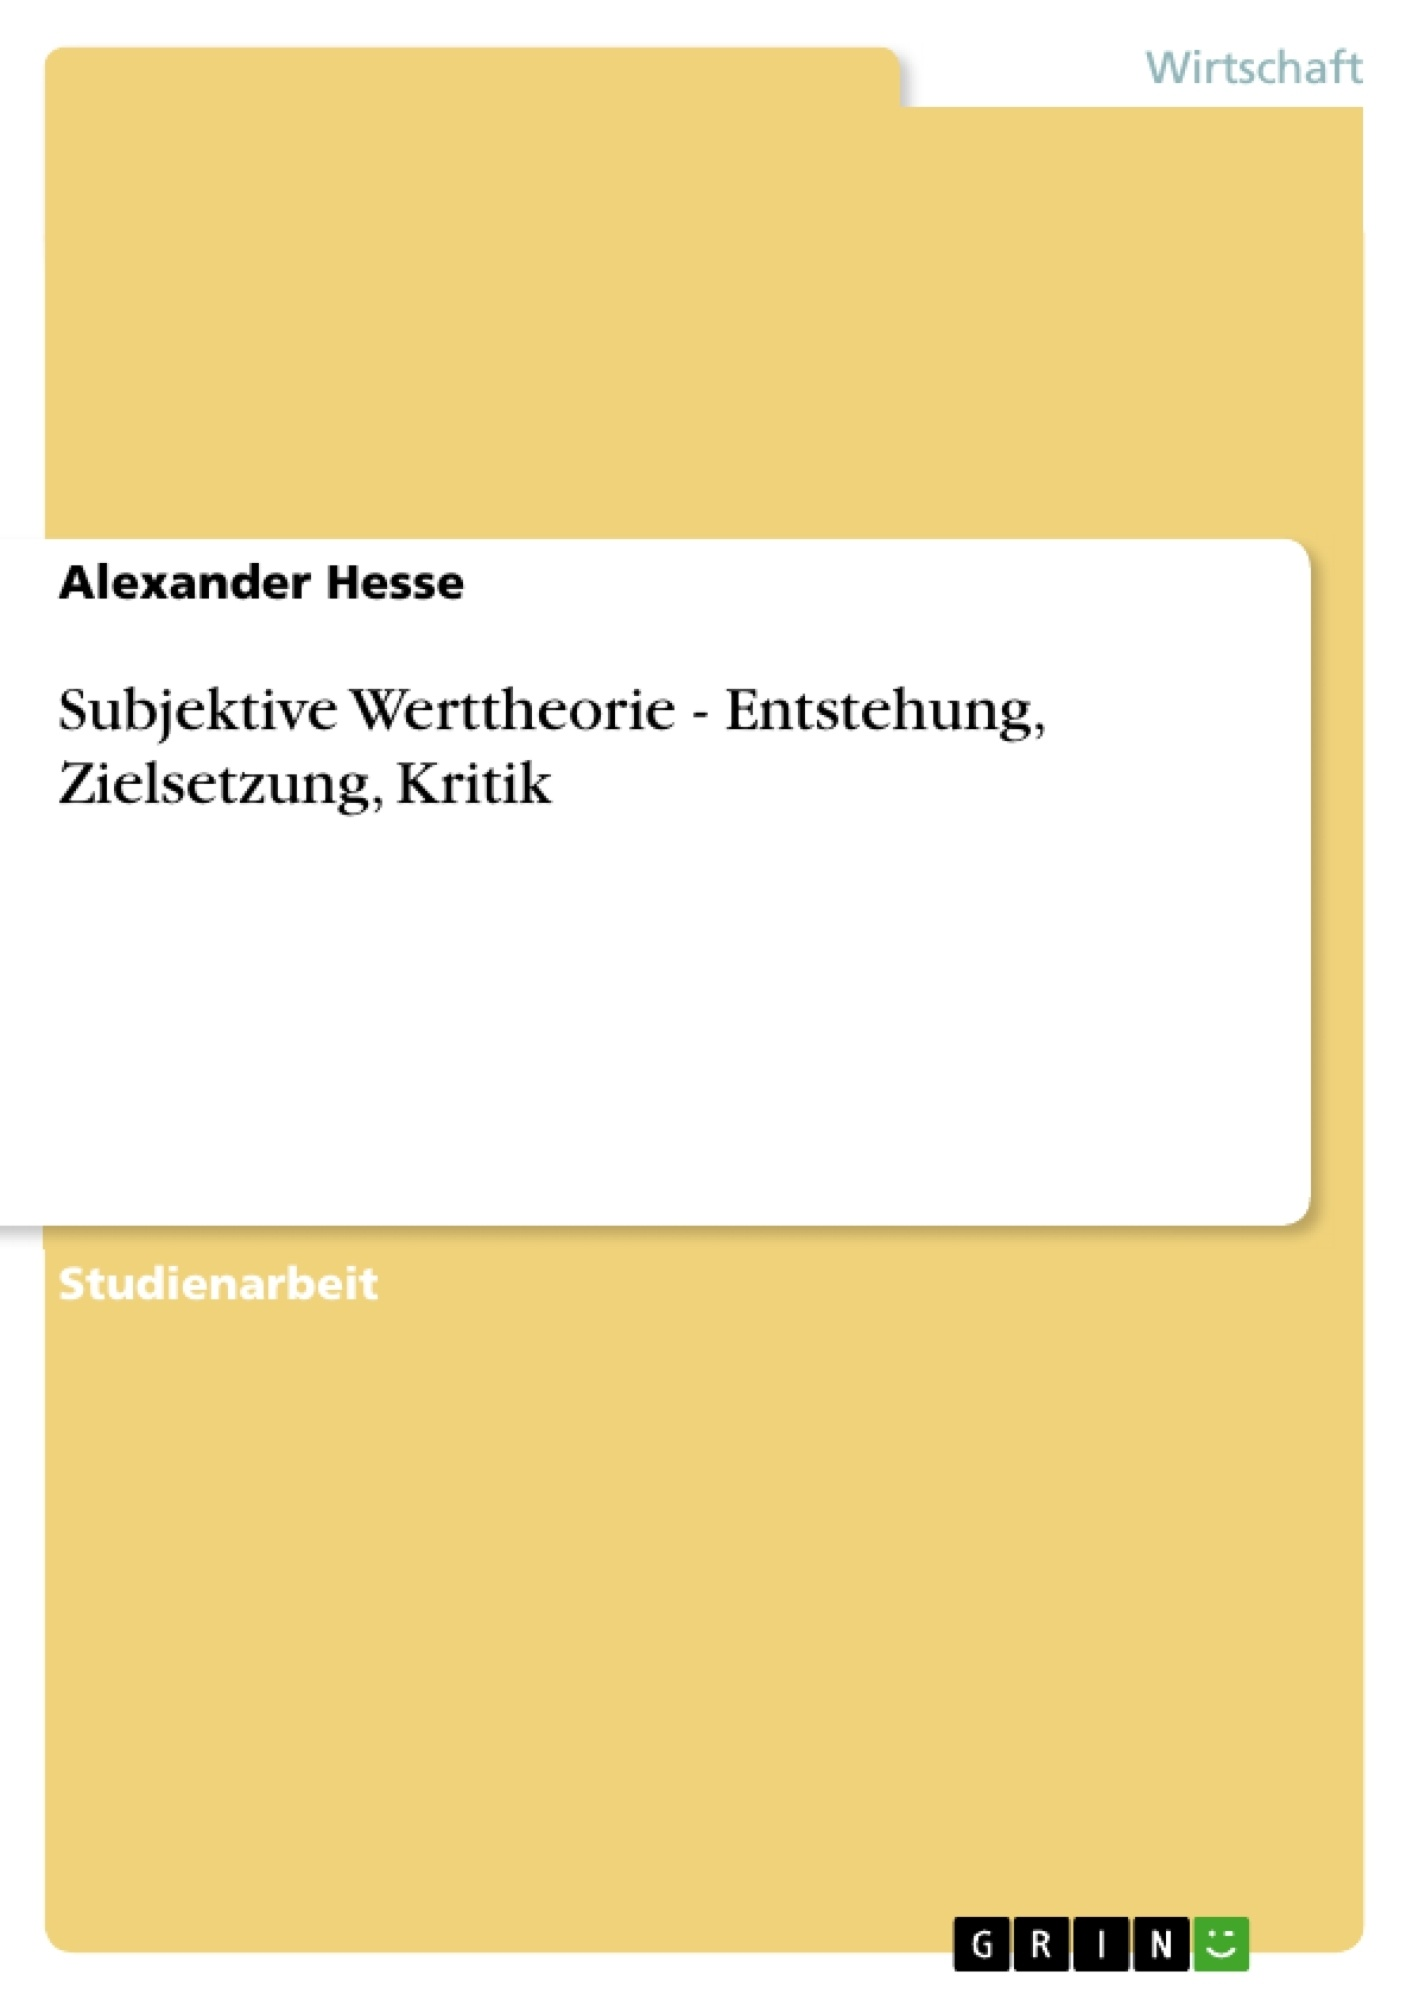 Titel: Subjektive Werttheorie - Entstehung, Zielsetzung, Kritik